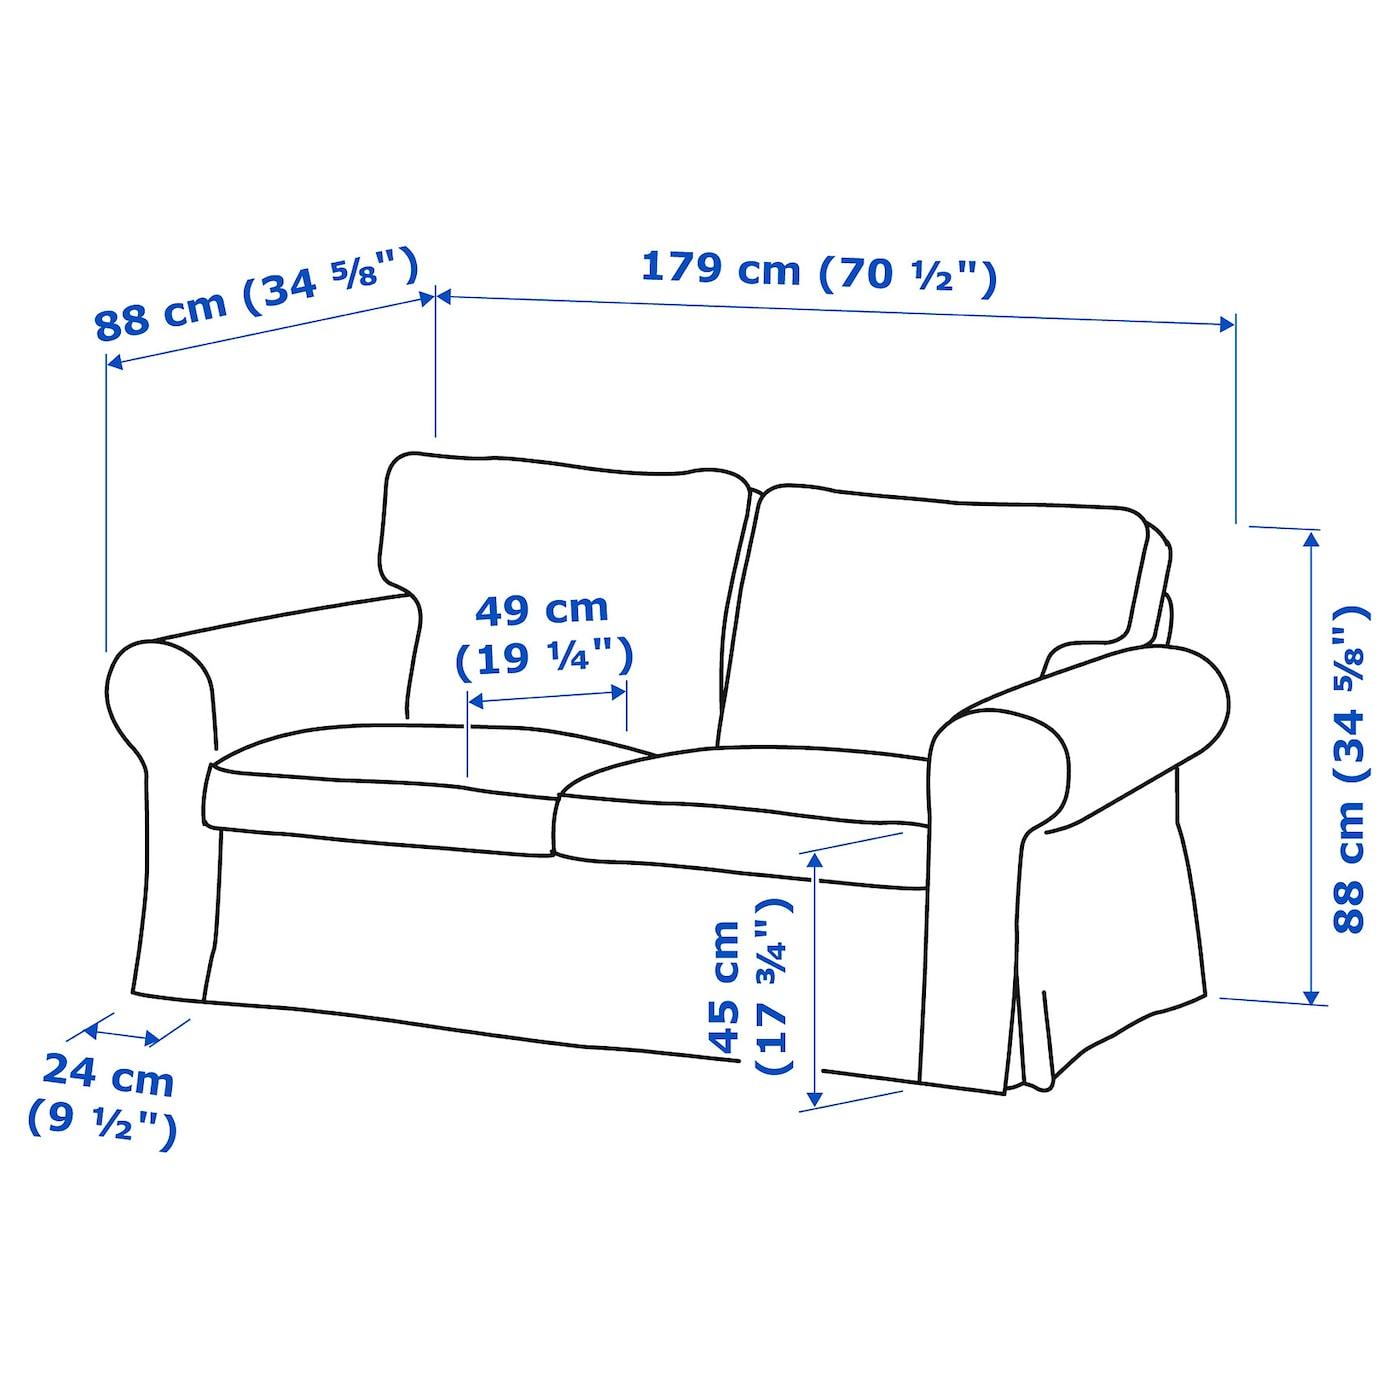 ikea sofa ektorp 2 plazas